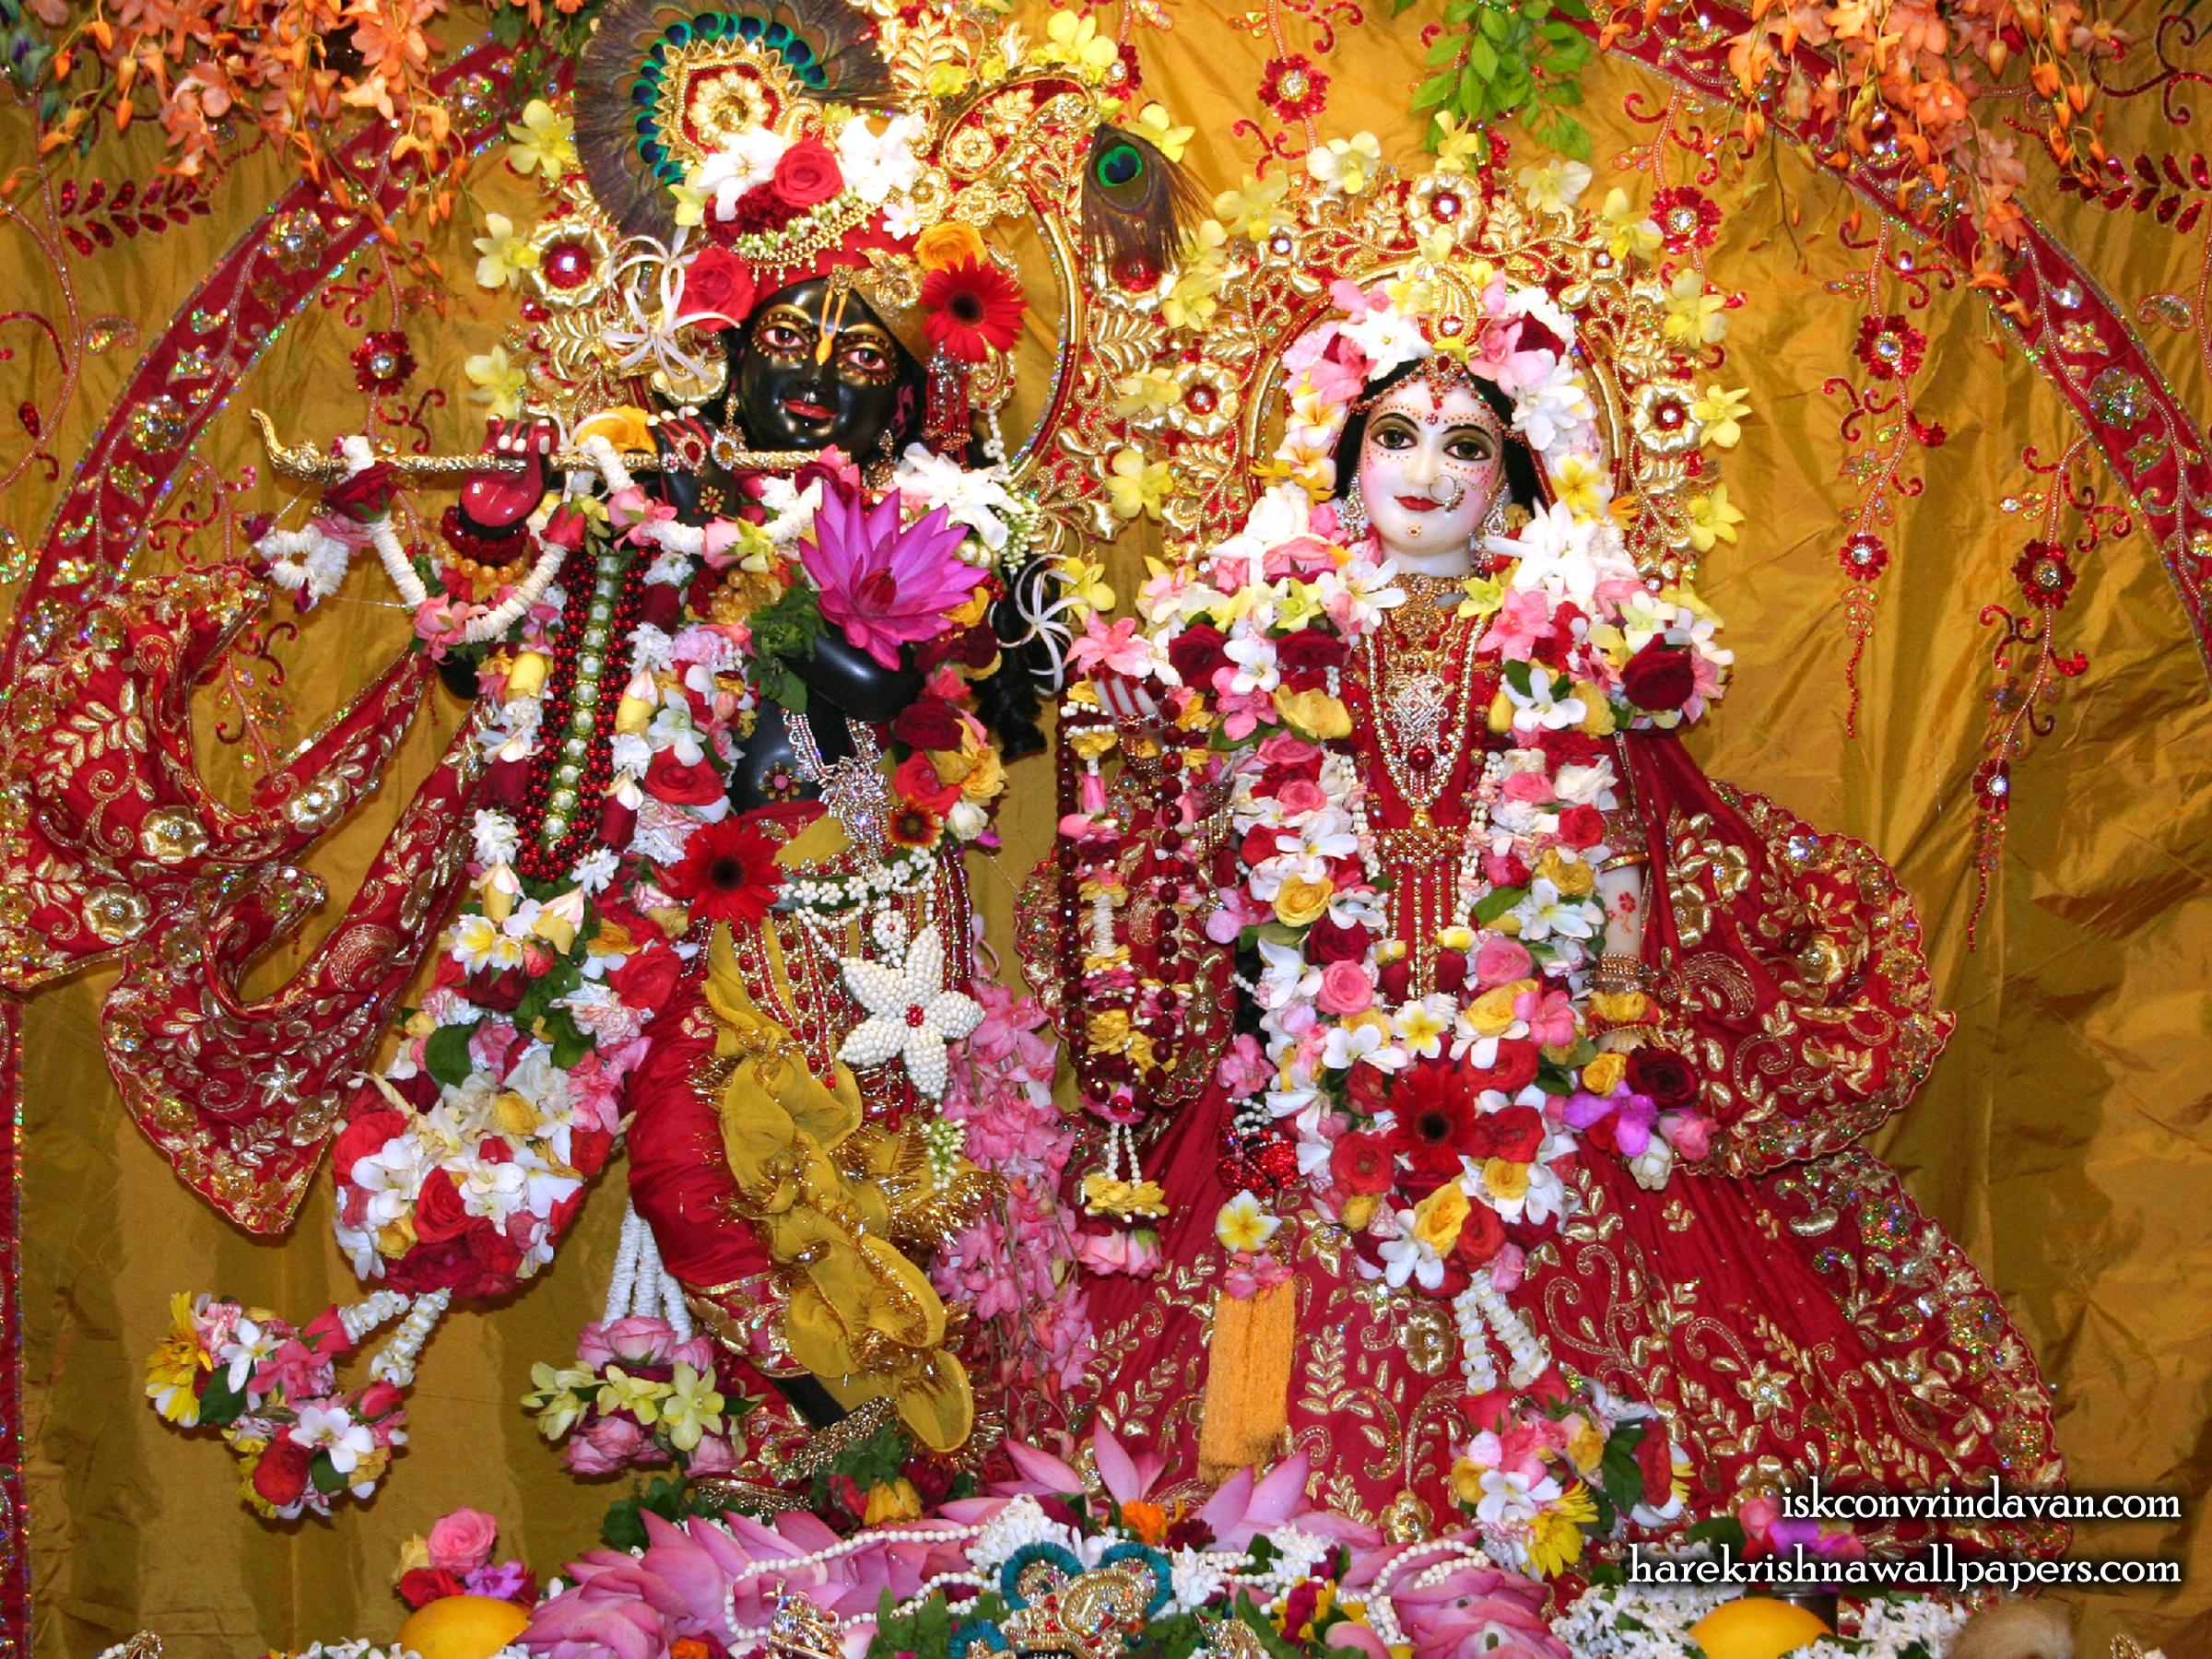 Sri Sri Radha Shyamsundar Wallpaper (004) Size 2400x1800 Download